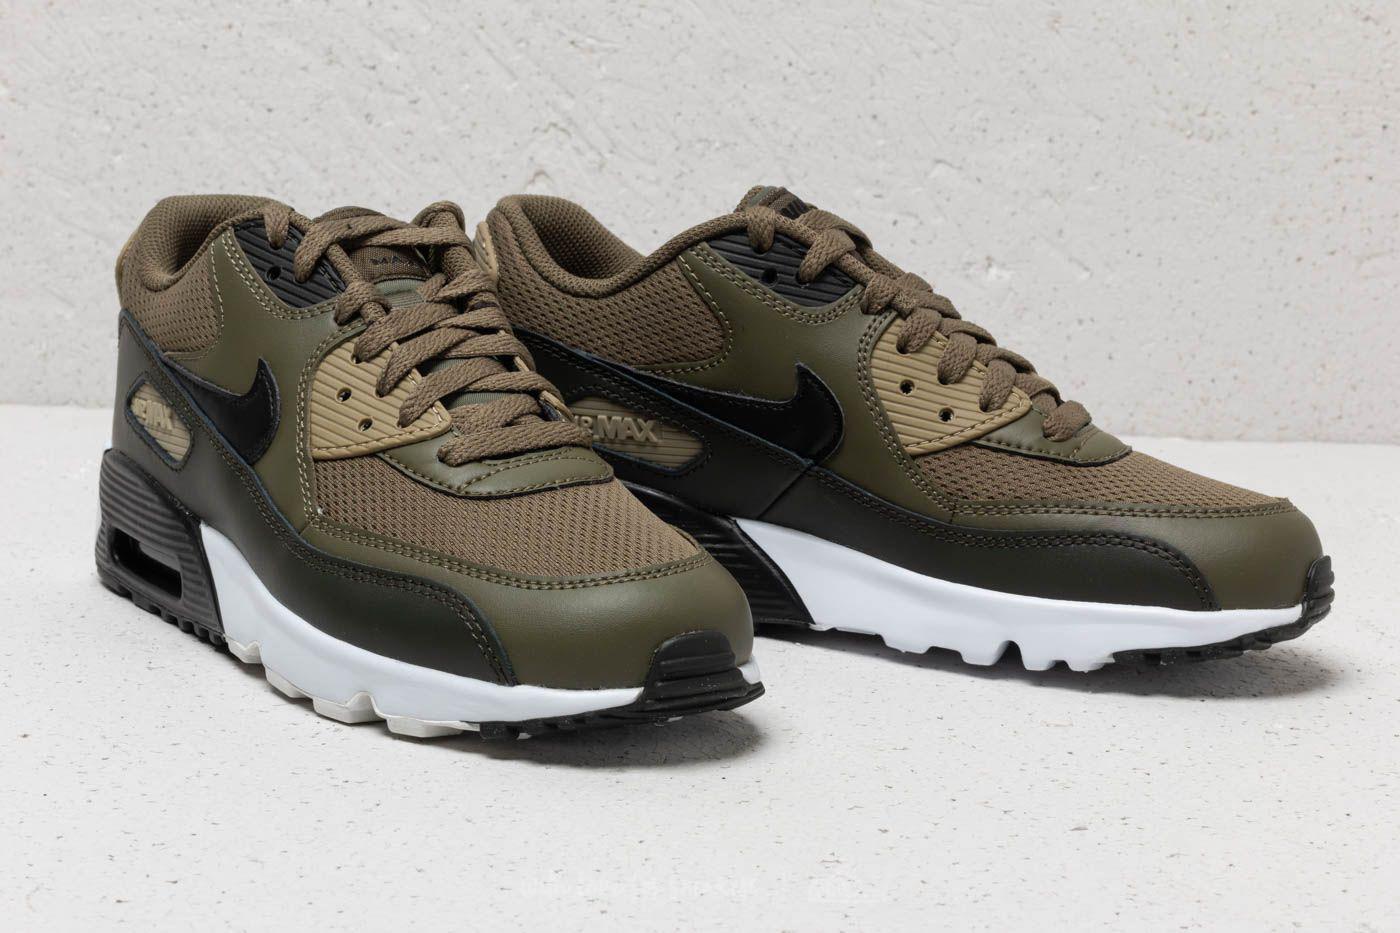 buy online 04a5c f5c30 Lyst - Nike Air Max 90 Mesh (gs) Medium Olive  Black-sequoia in Black